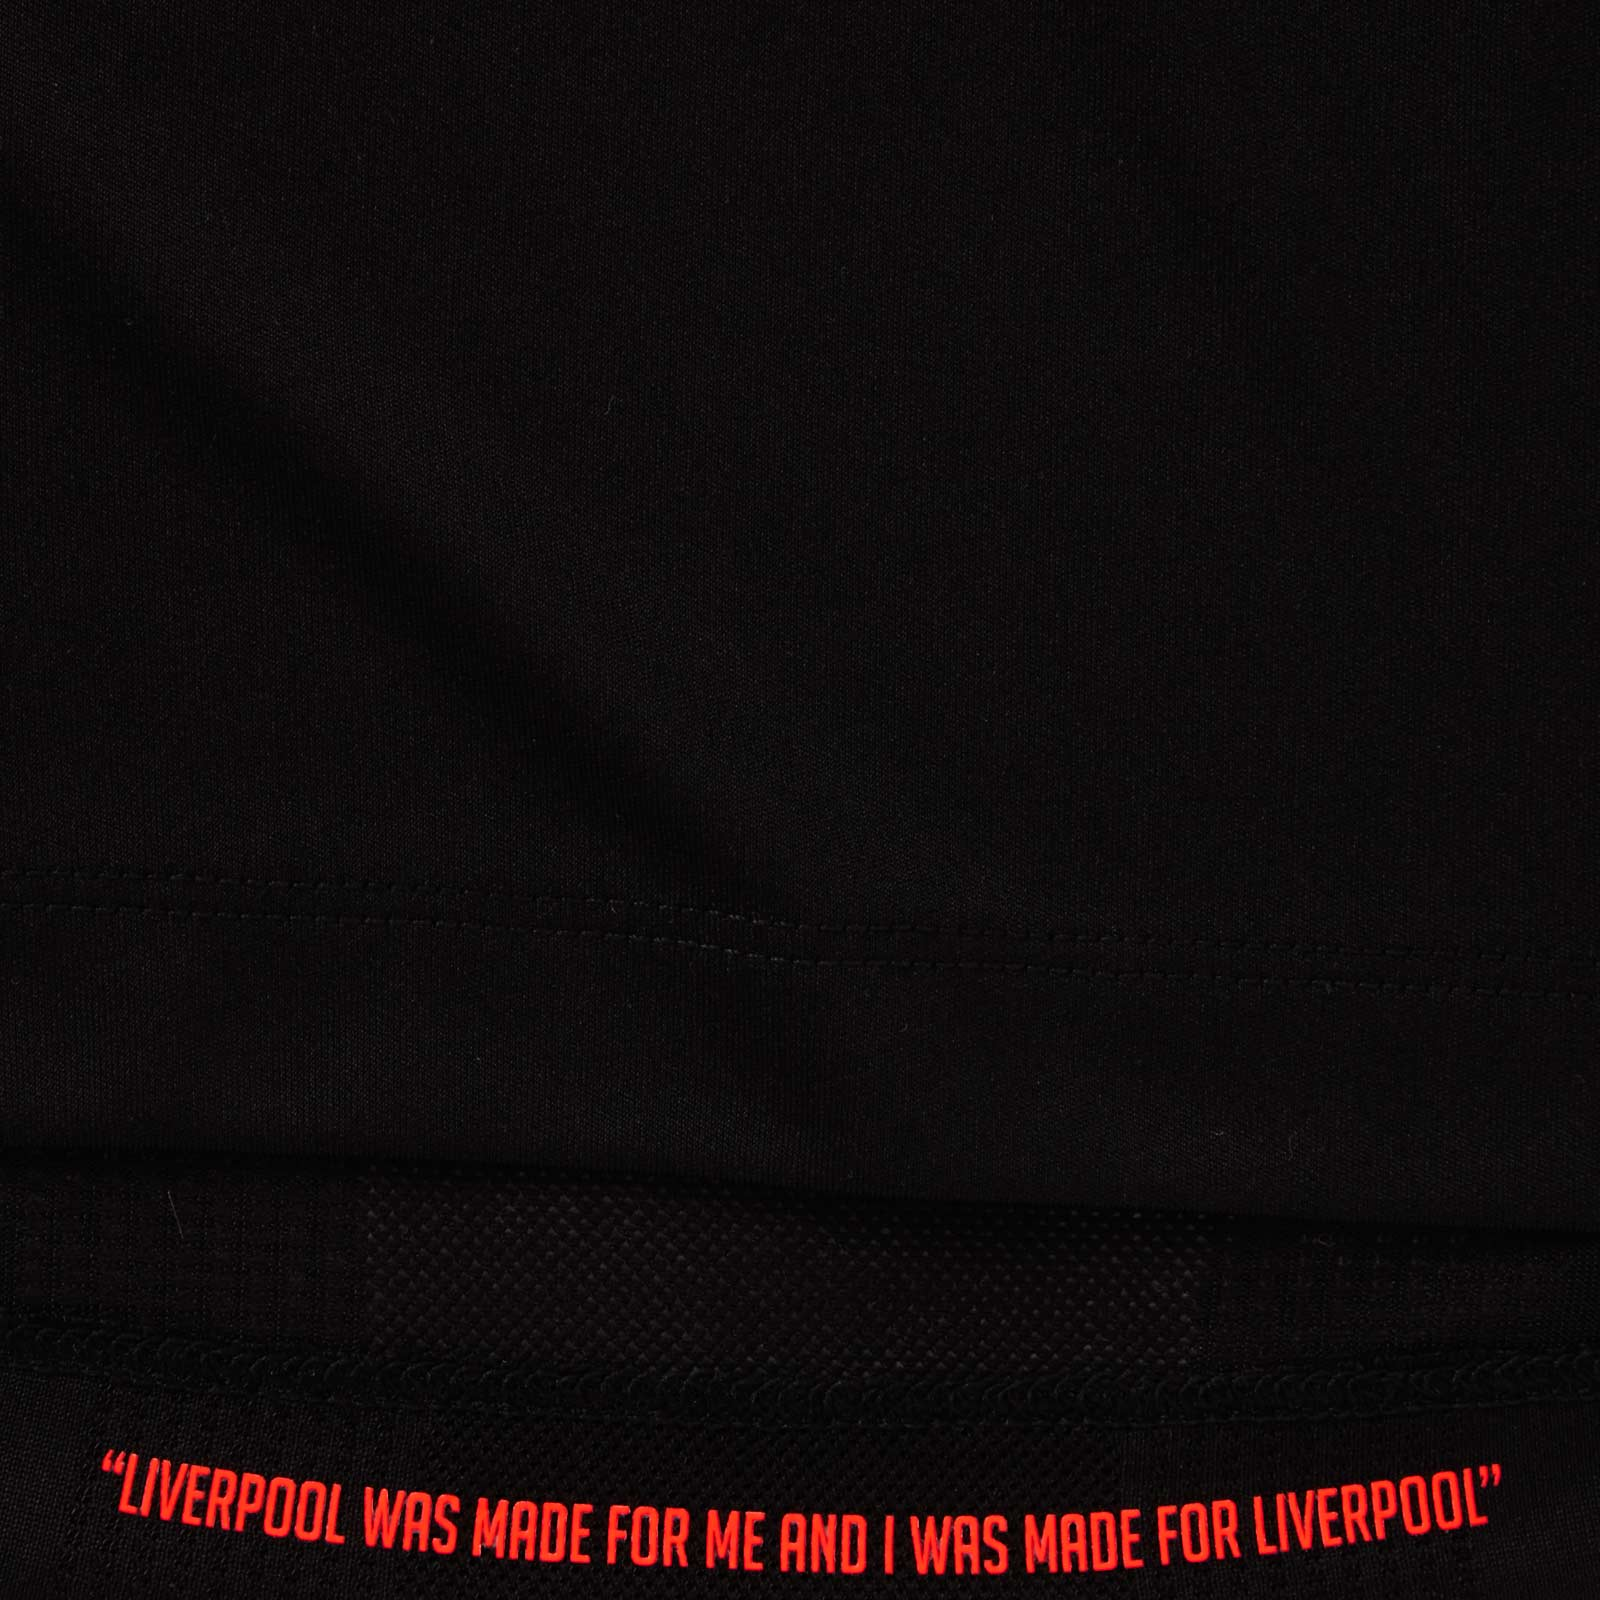 NB_Licence_Liverpool_Away_Kit_2016-17 Motif